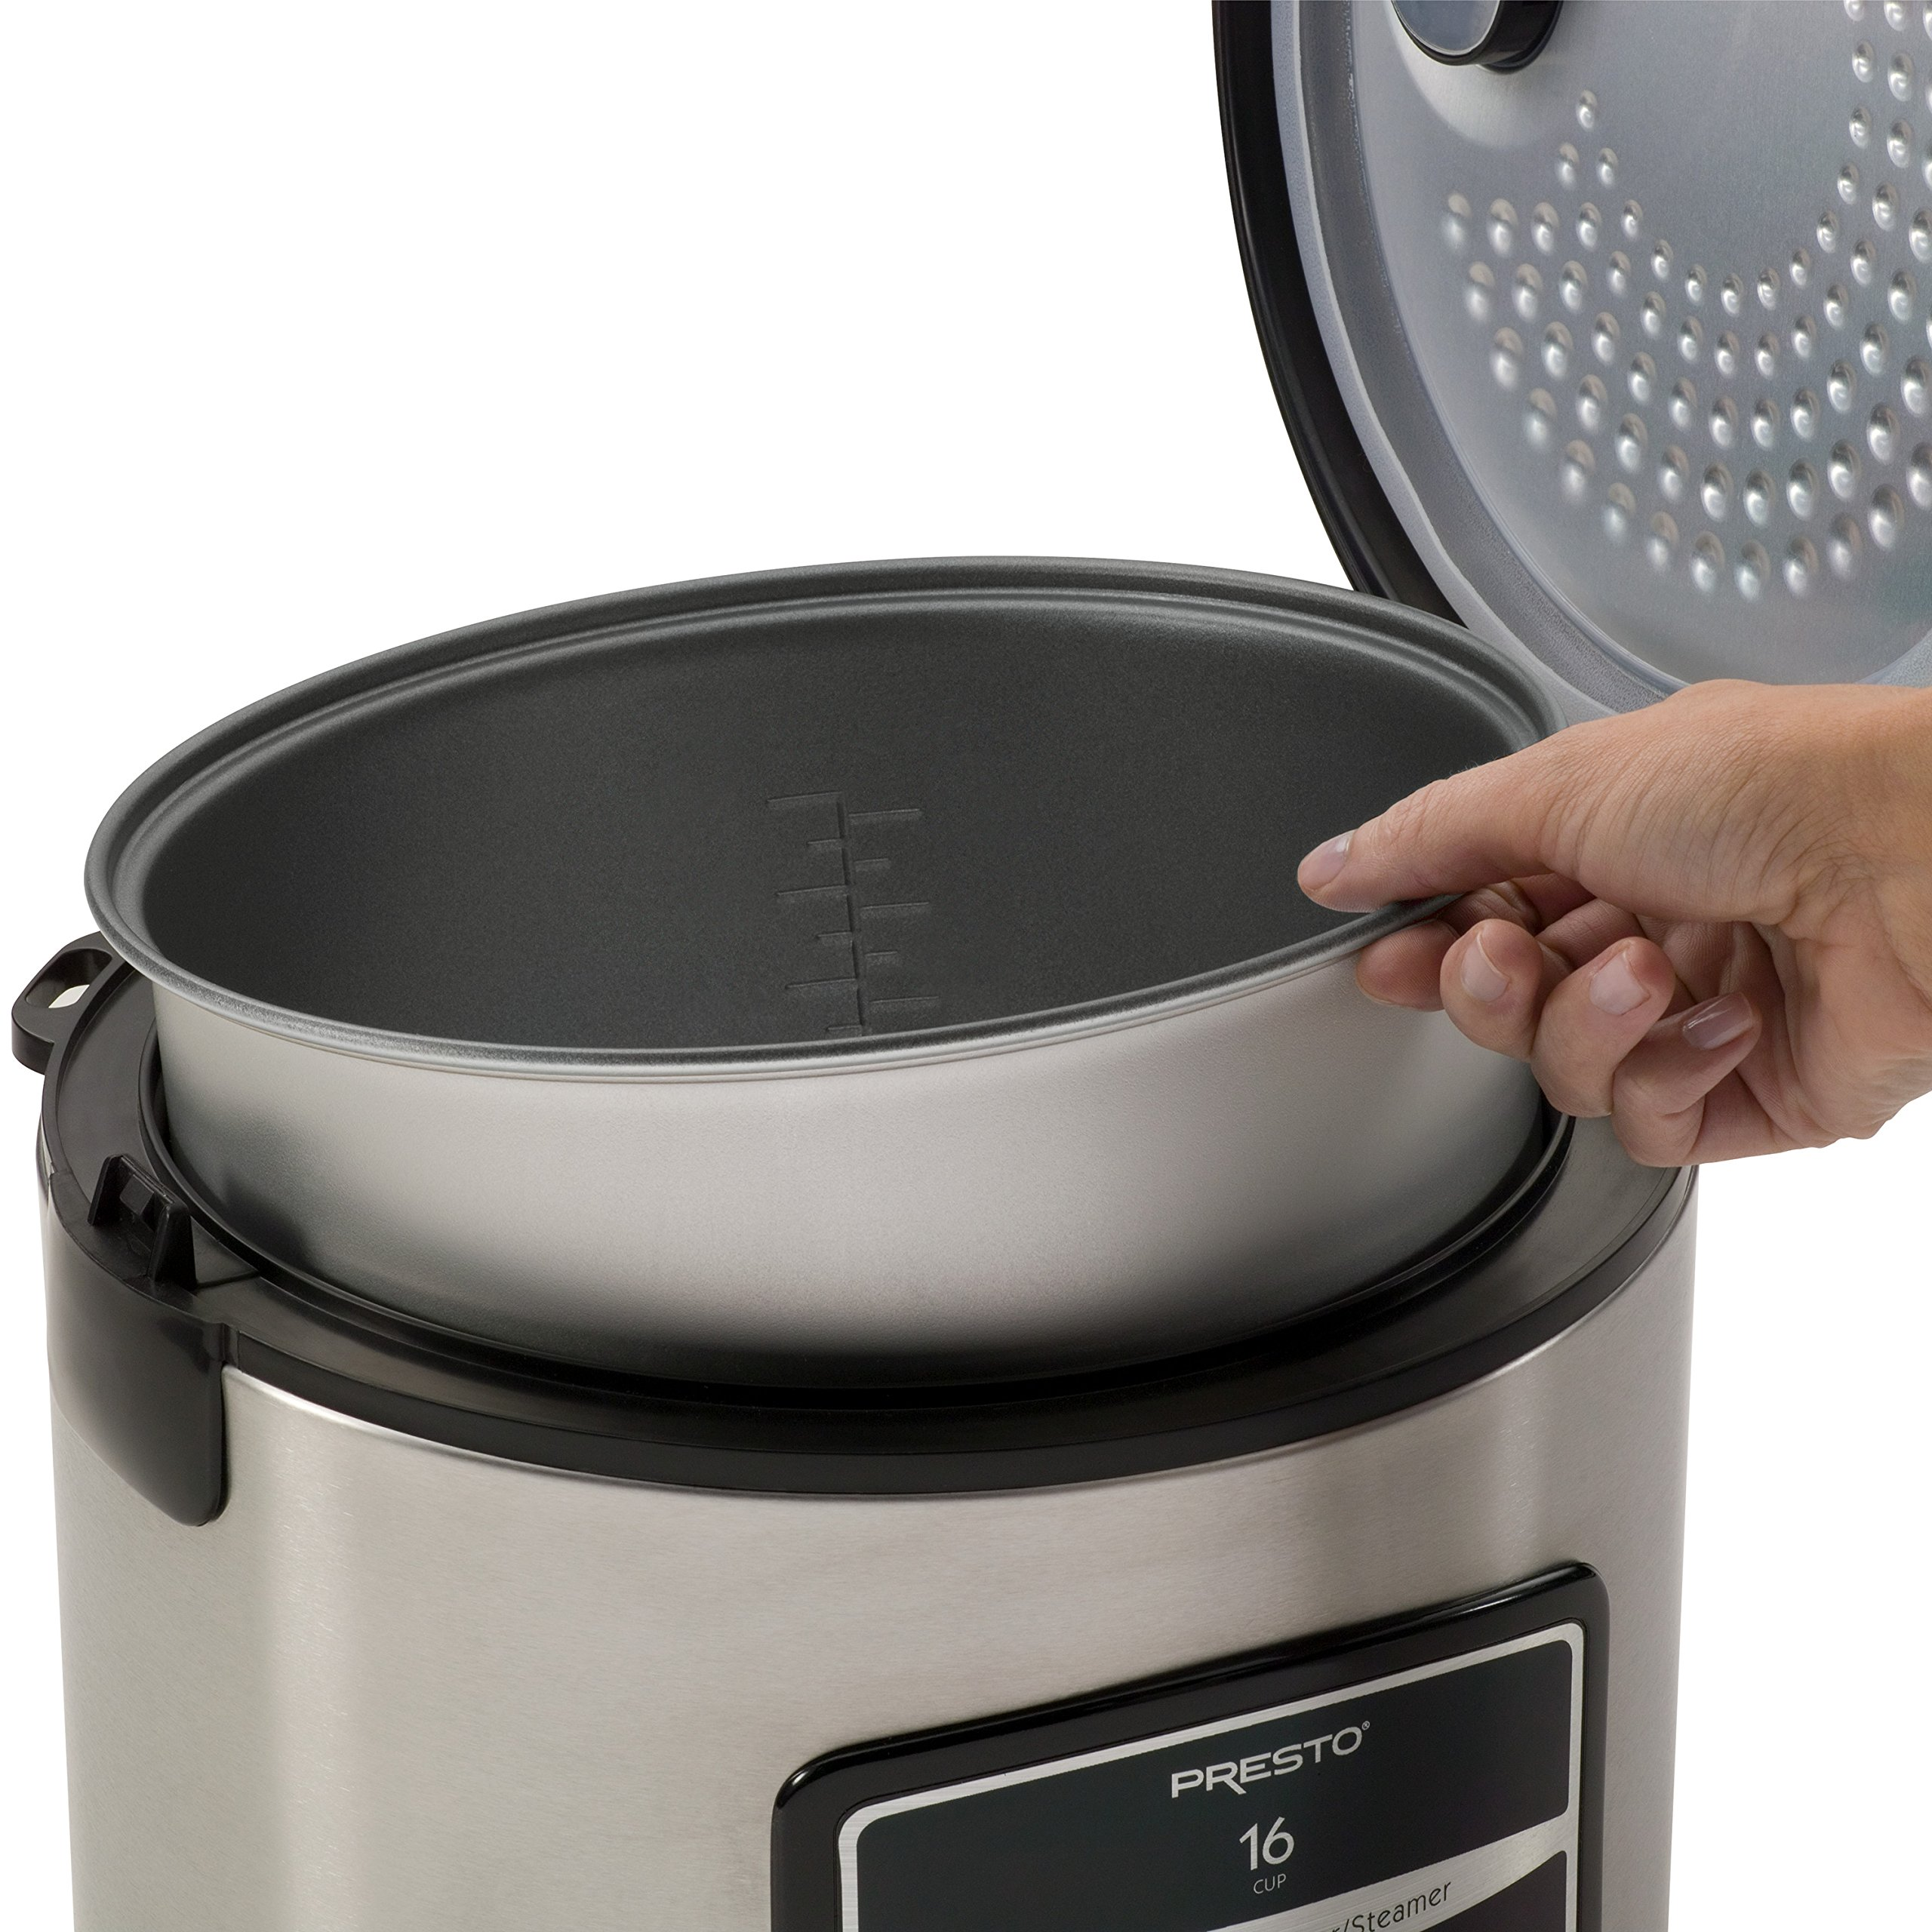 Presto 05813 16-Cup Digital Stainless Steel Rice Cooker/Steamer by Presto